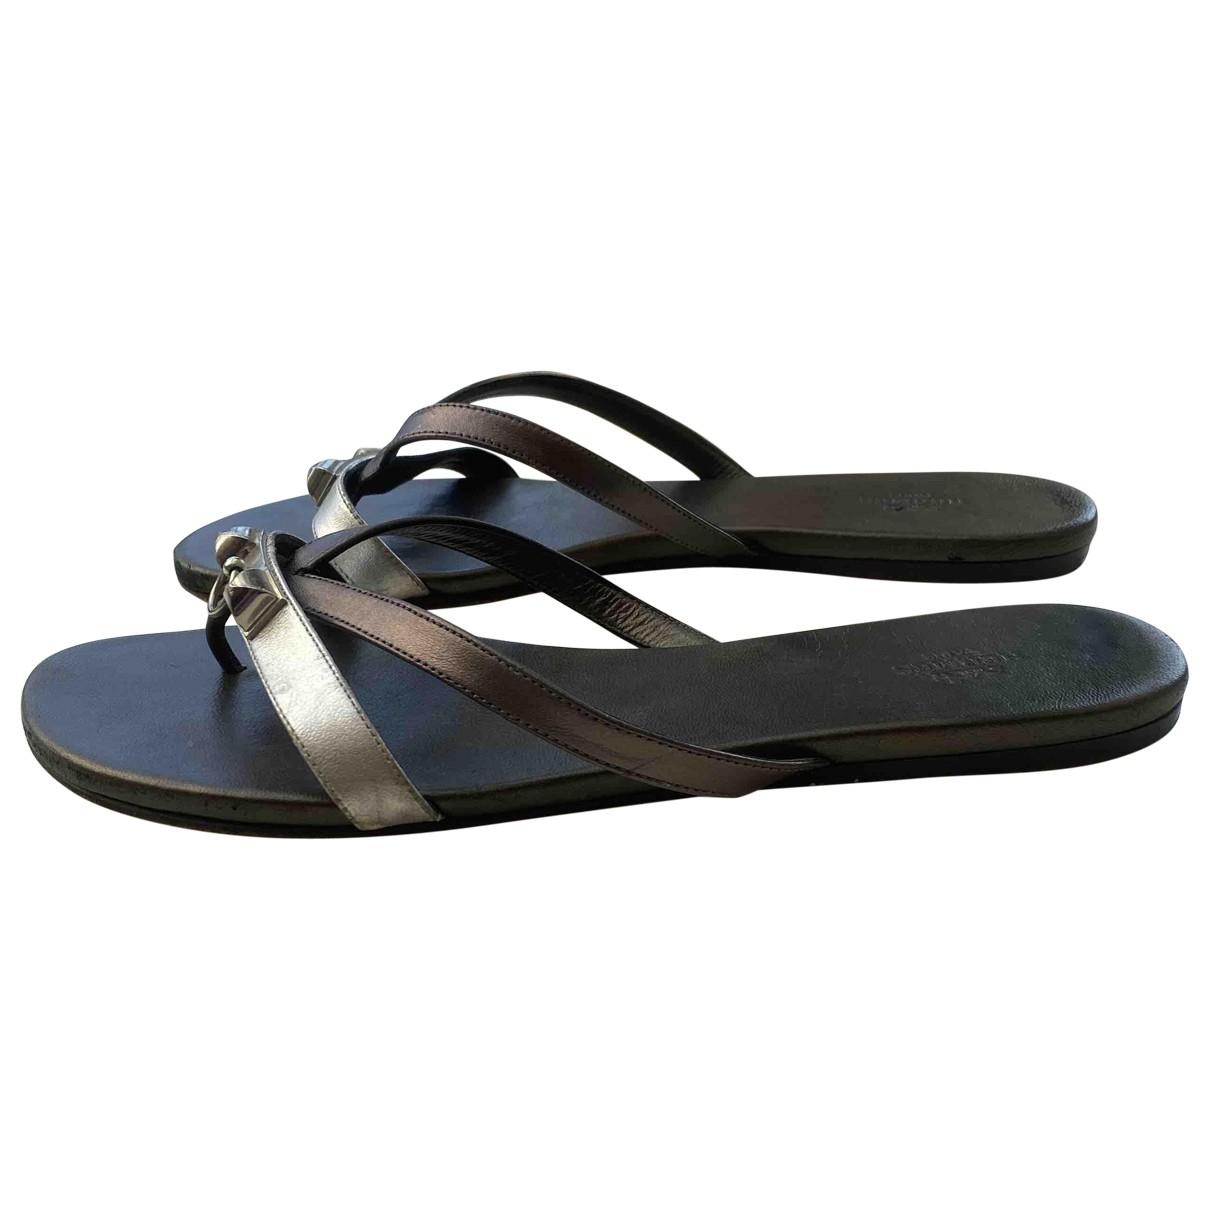 Hermès \N Grey Leather Sandals for Women 39 EU